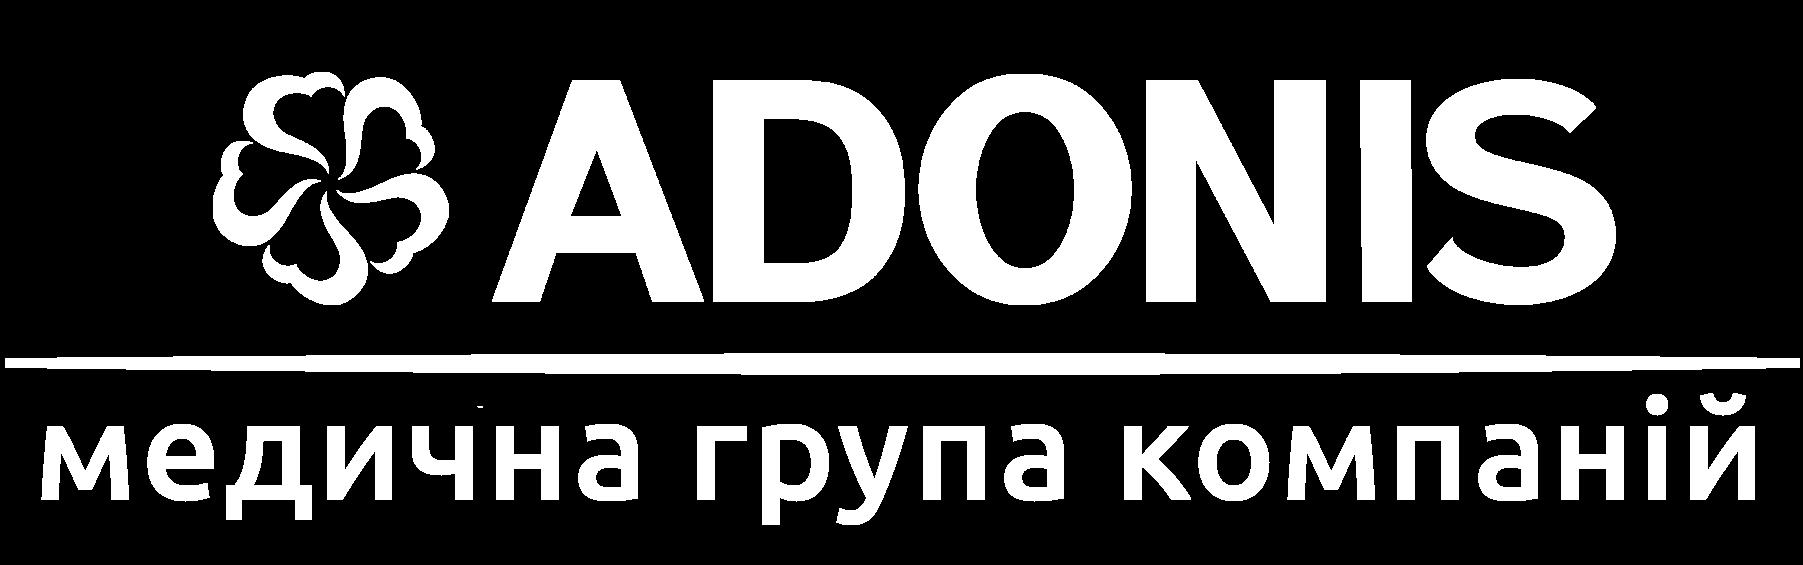 МЦ ADONIS